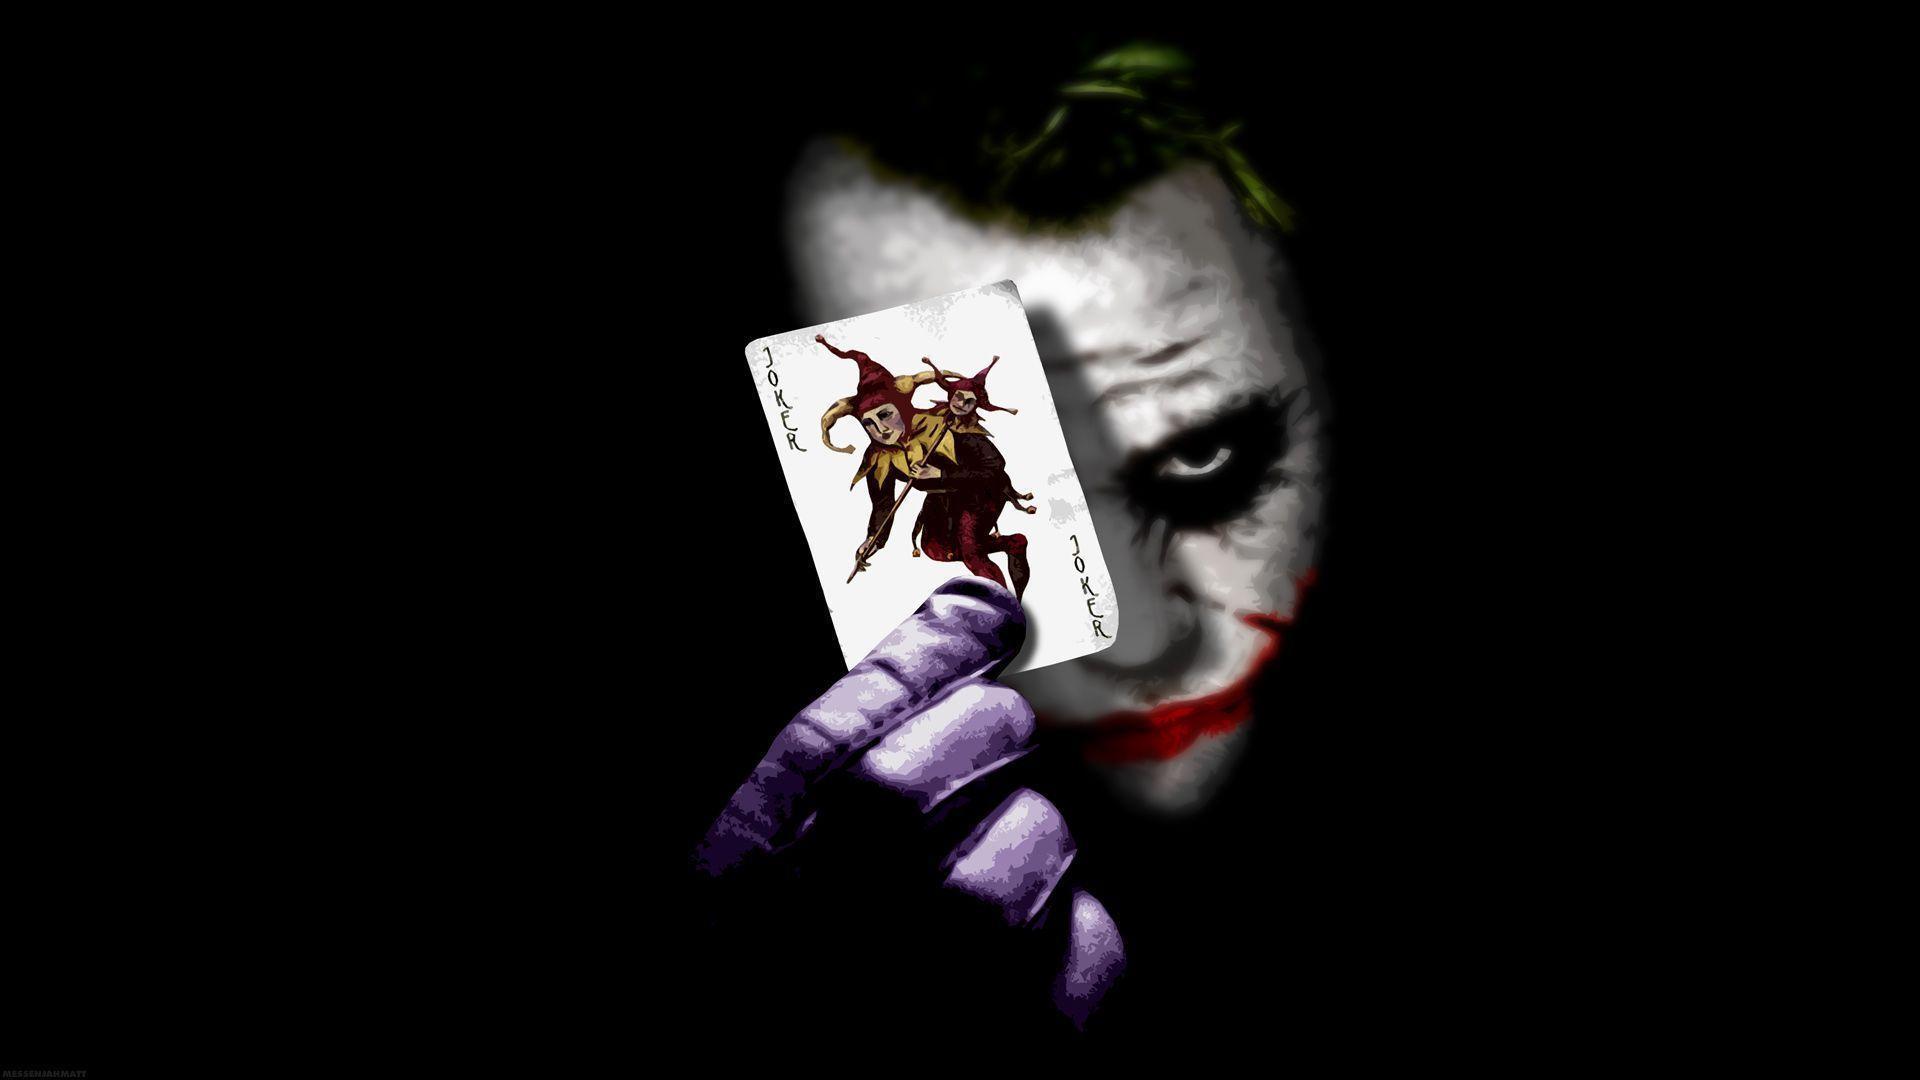 Joker HD Wallpapers 1920x1080